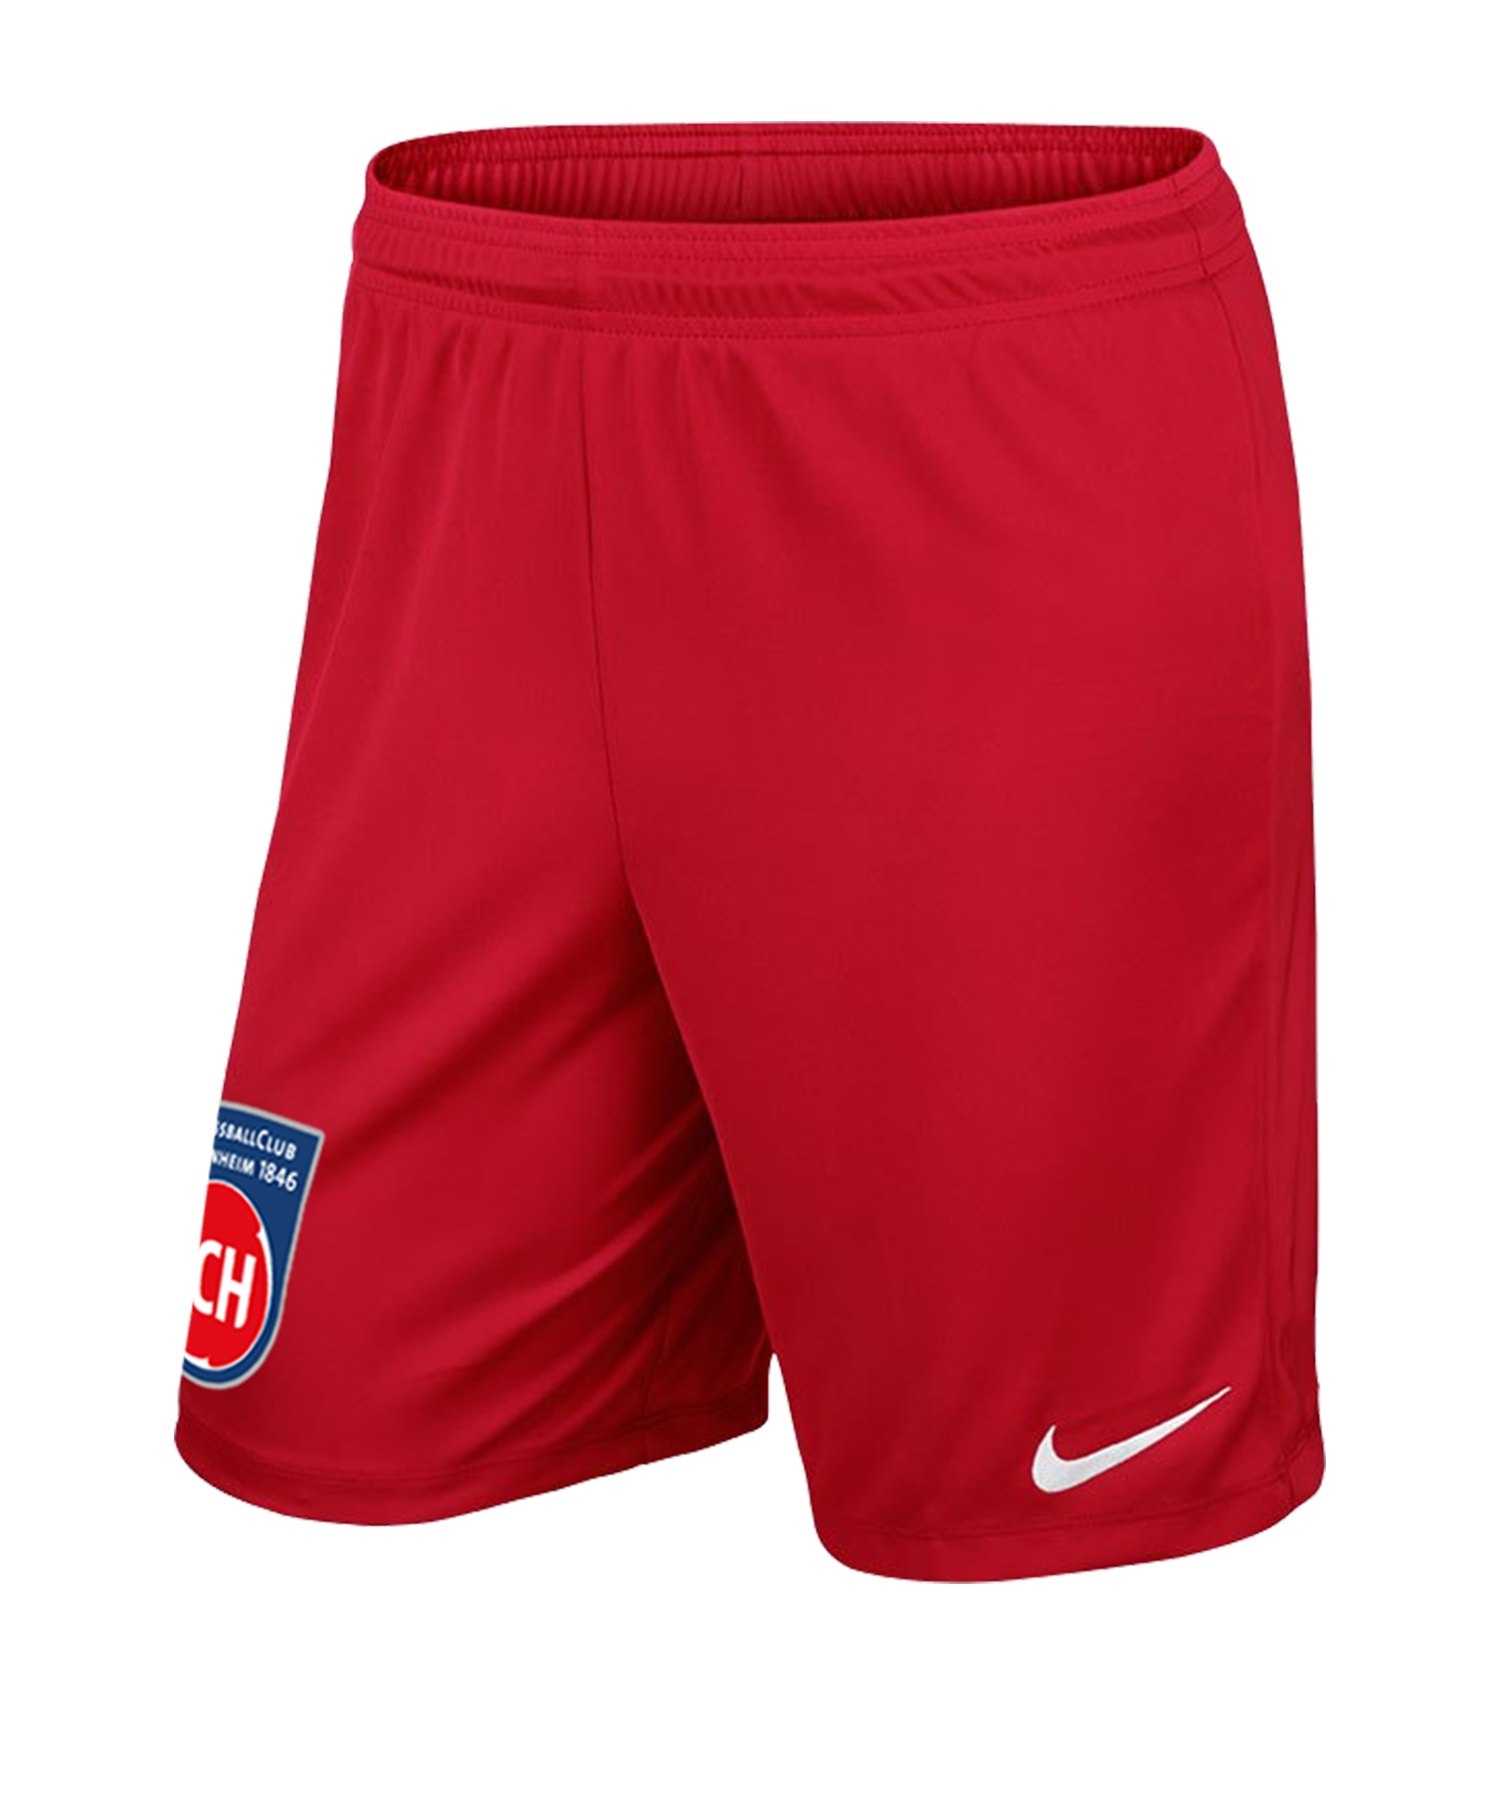 Nike 1. FC Heidenheim Short Home Kids 19/20 F657 - rot